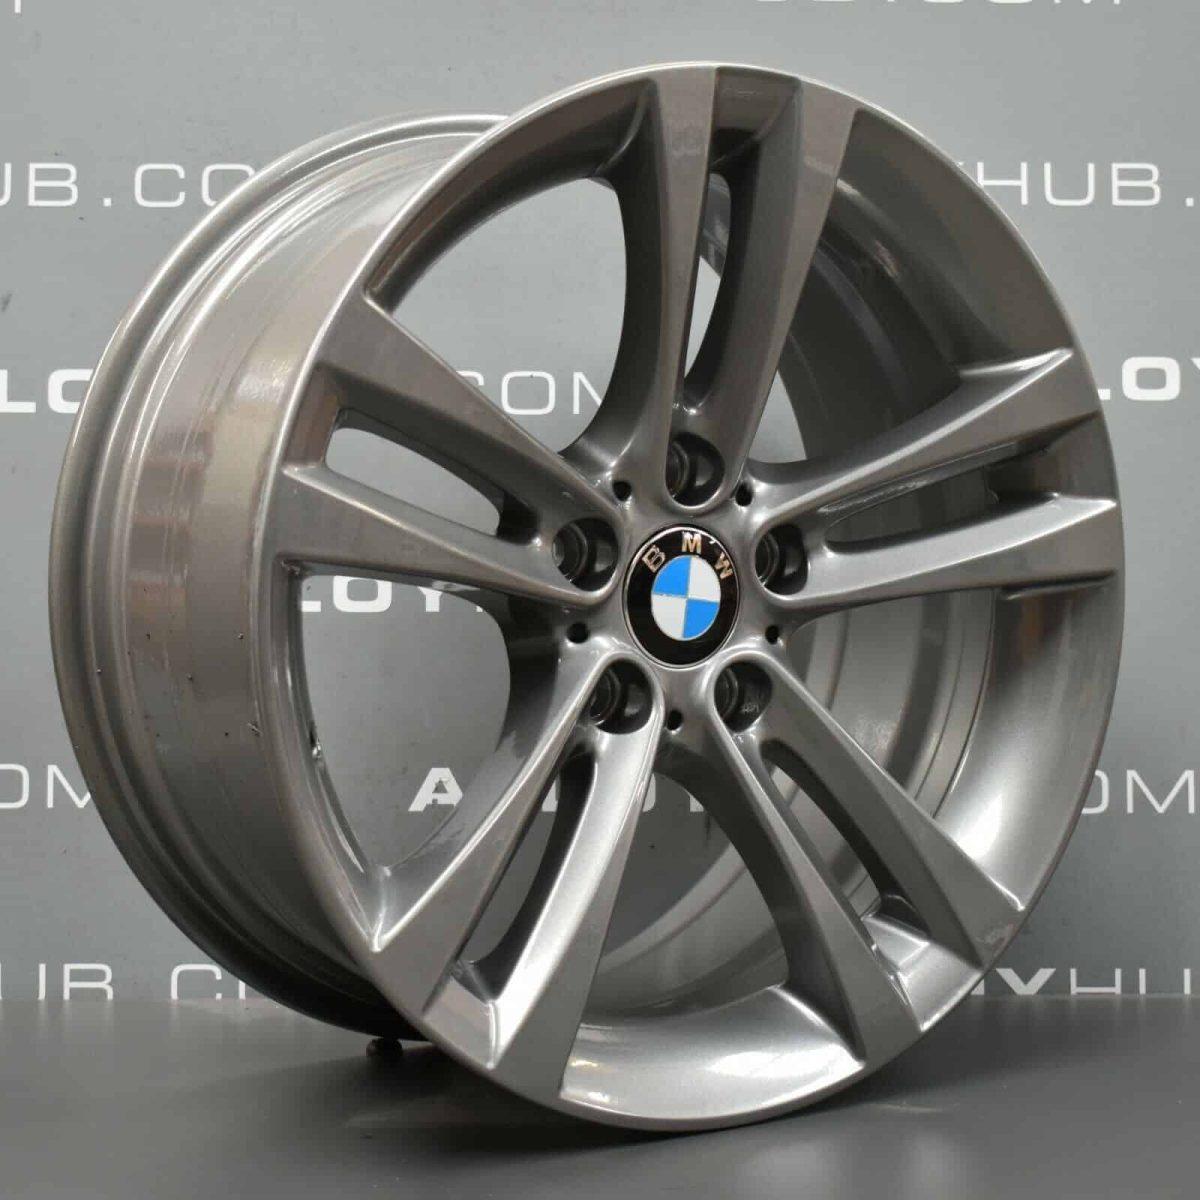 Genuine BMW 3/4 Series Style 397 M Sport 5 Twin Spoke 18″ Inch Alloy Wheels with Ferric Grey Finish 36116796247 36116868378